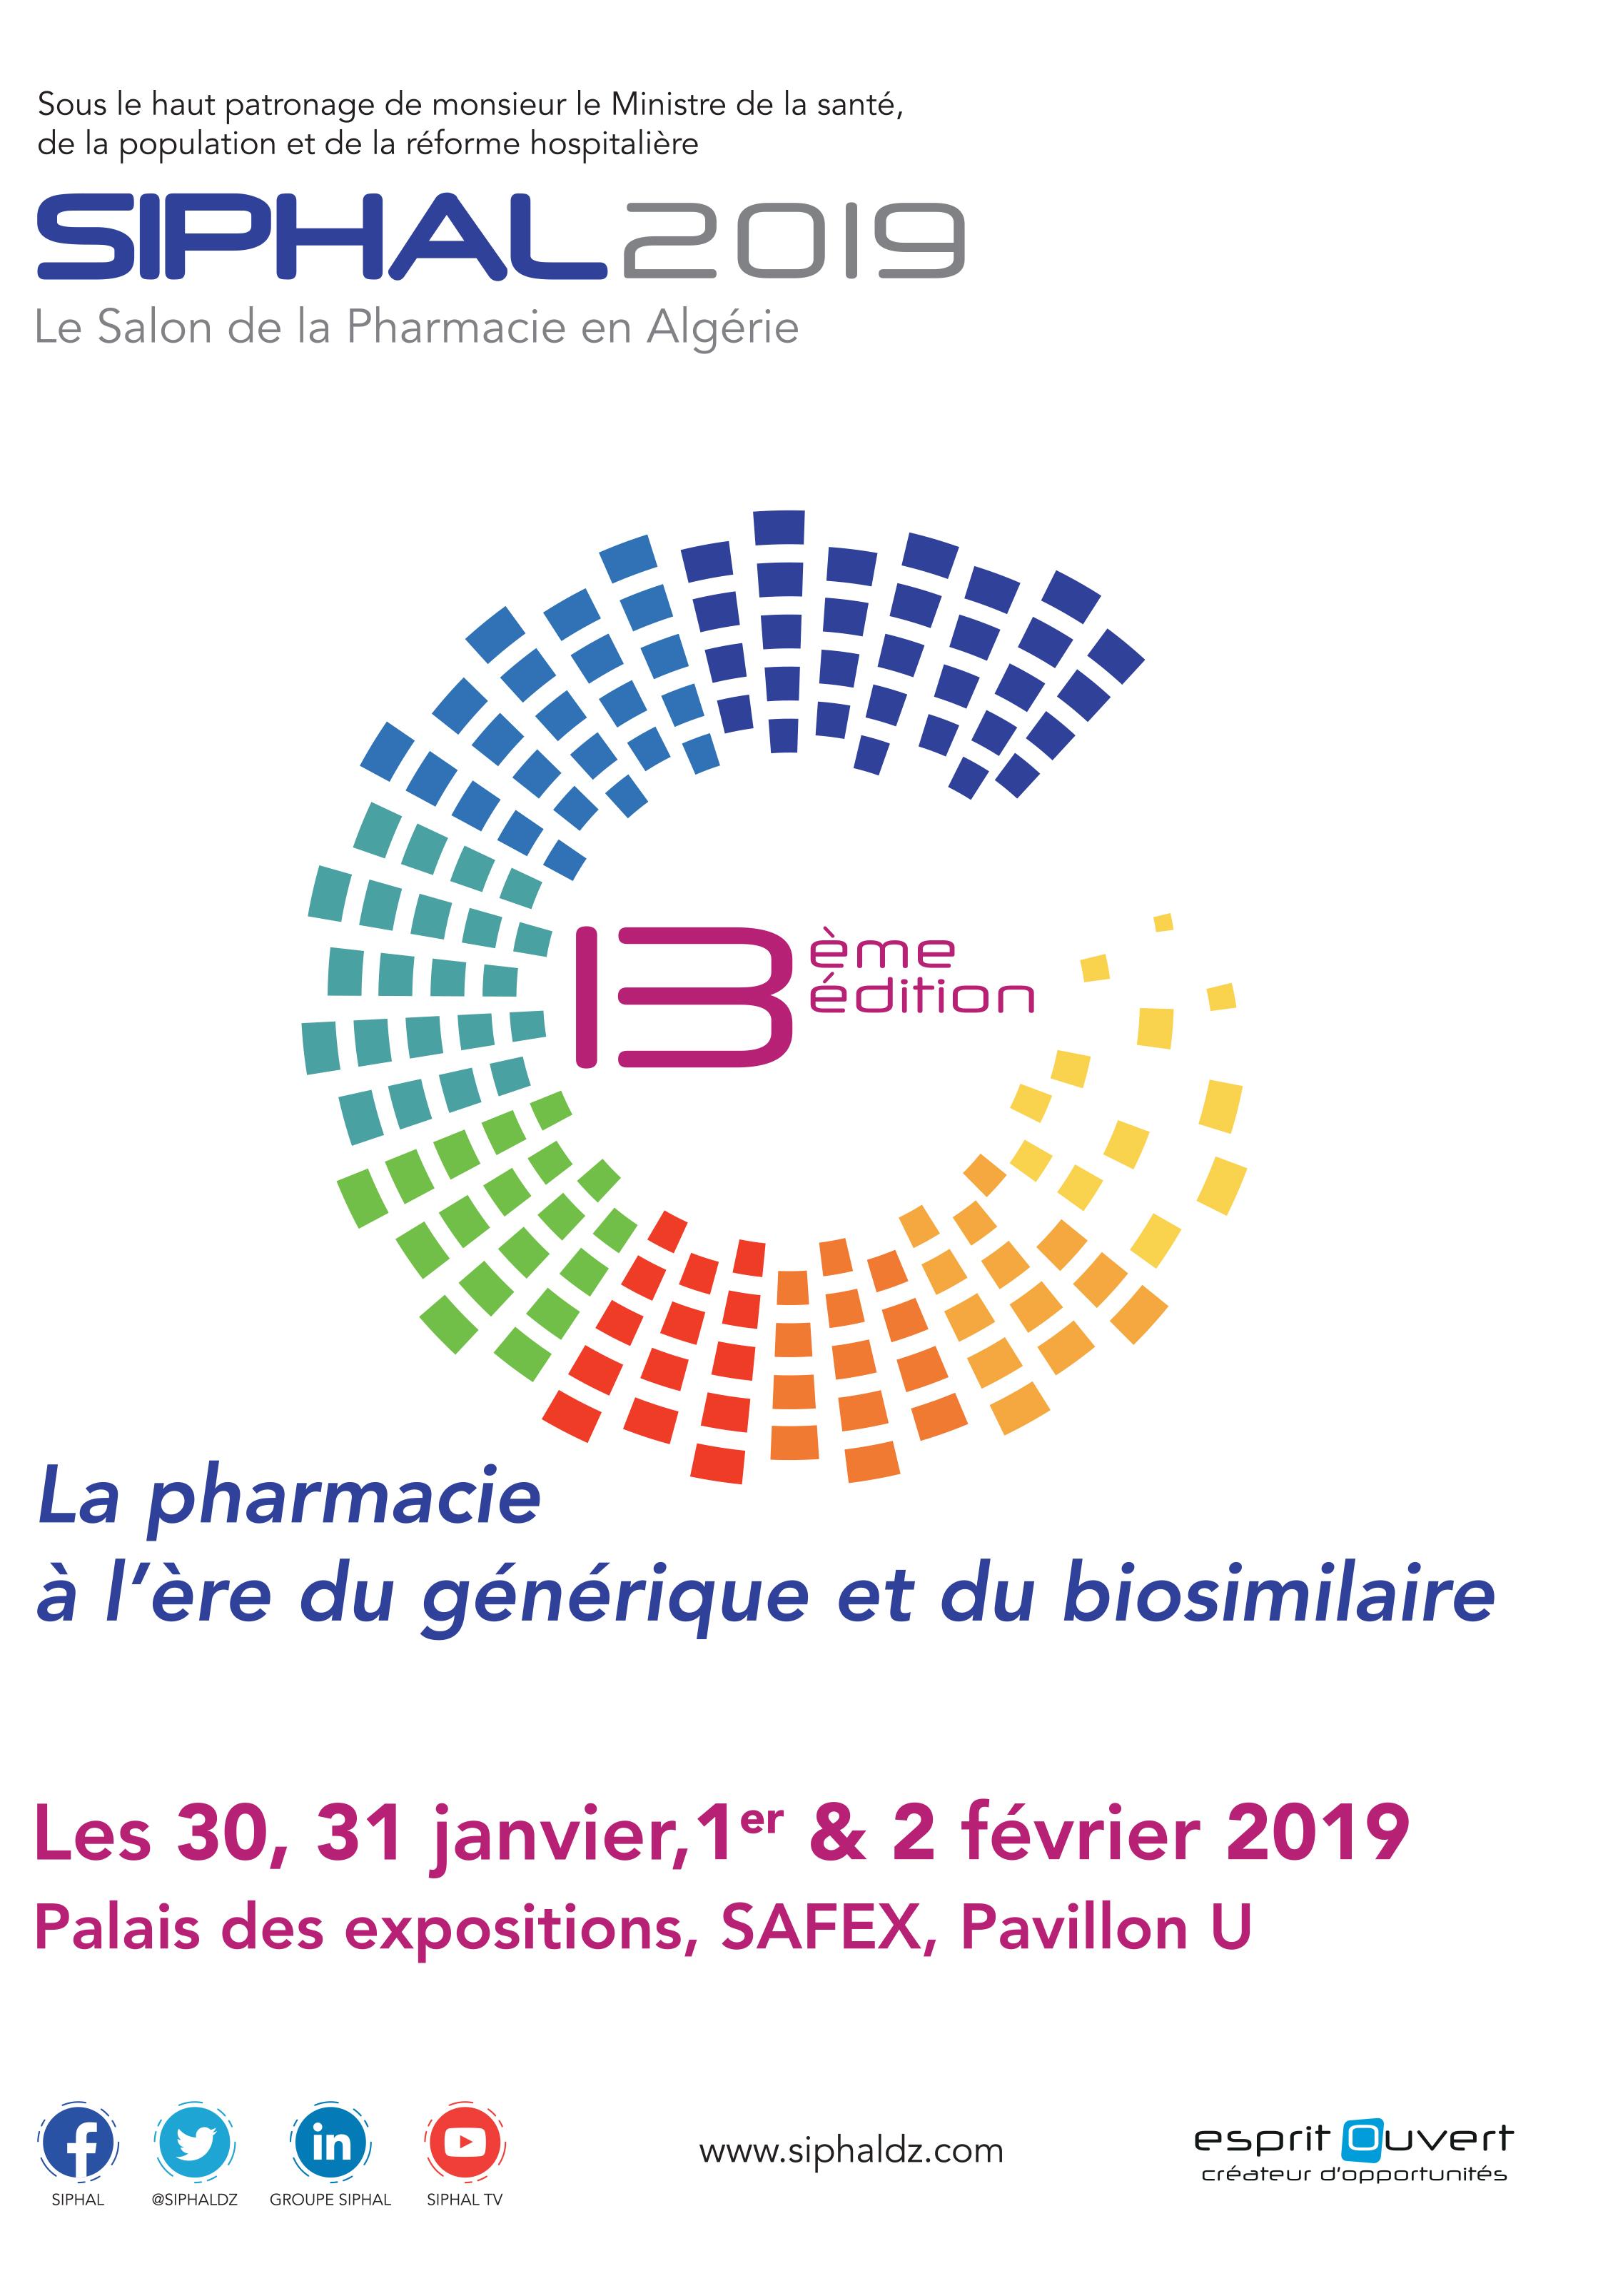 SIPHAL le salon de la pharmacie 2019